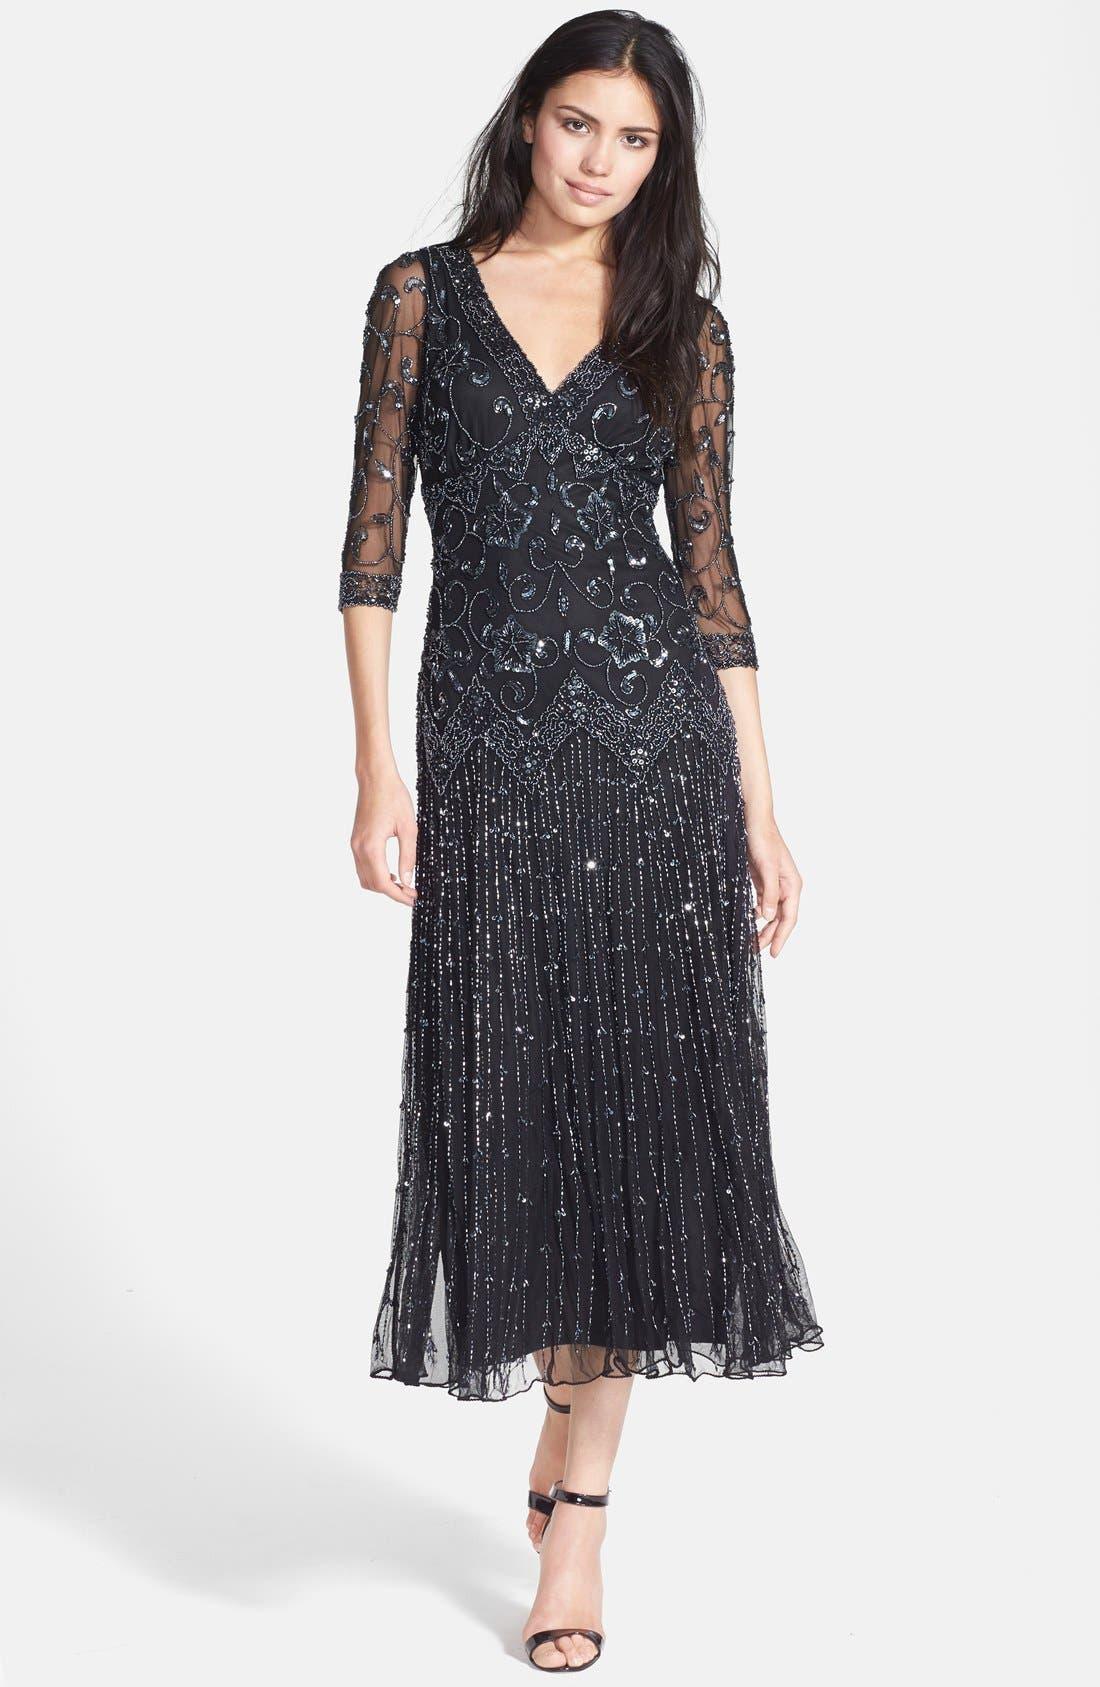 Alternate Image 1 Selected - Pisarro Nights Beaded Mesh Dress (Regular & Petite)